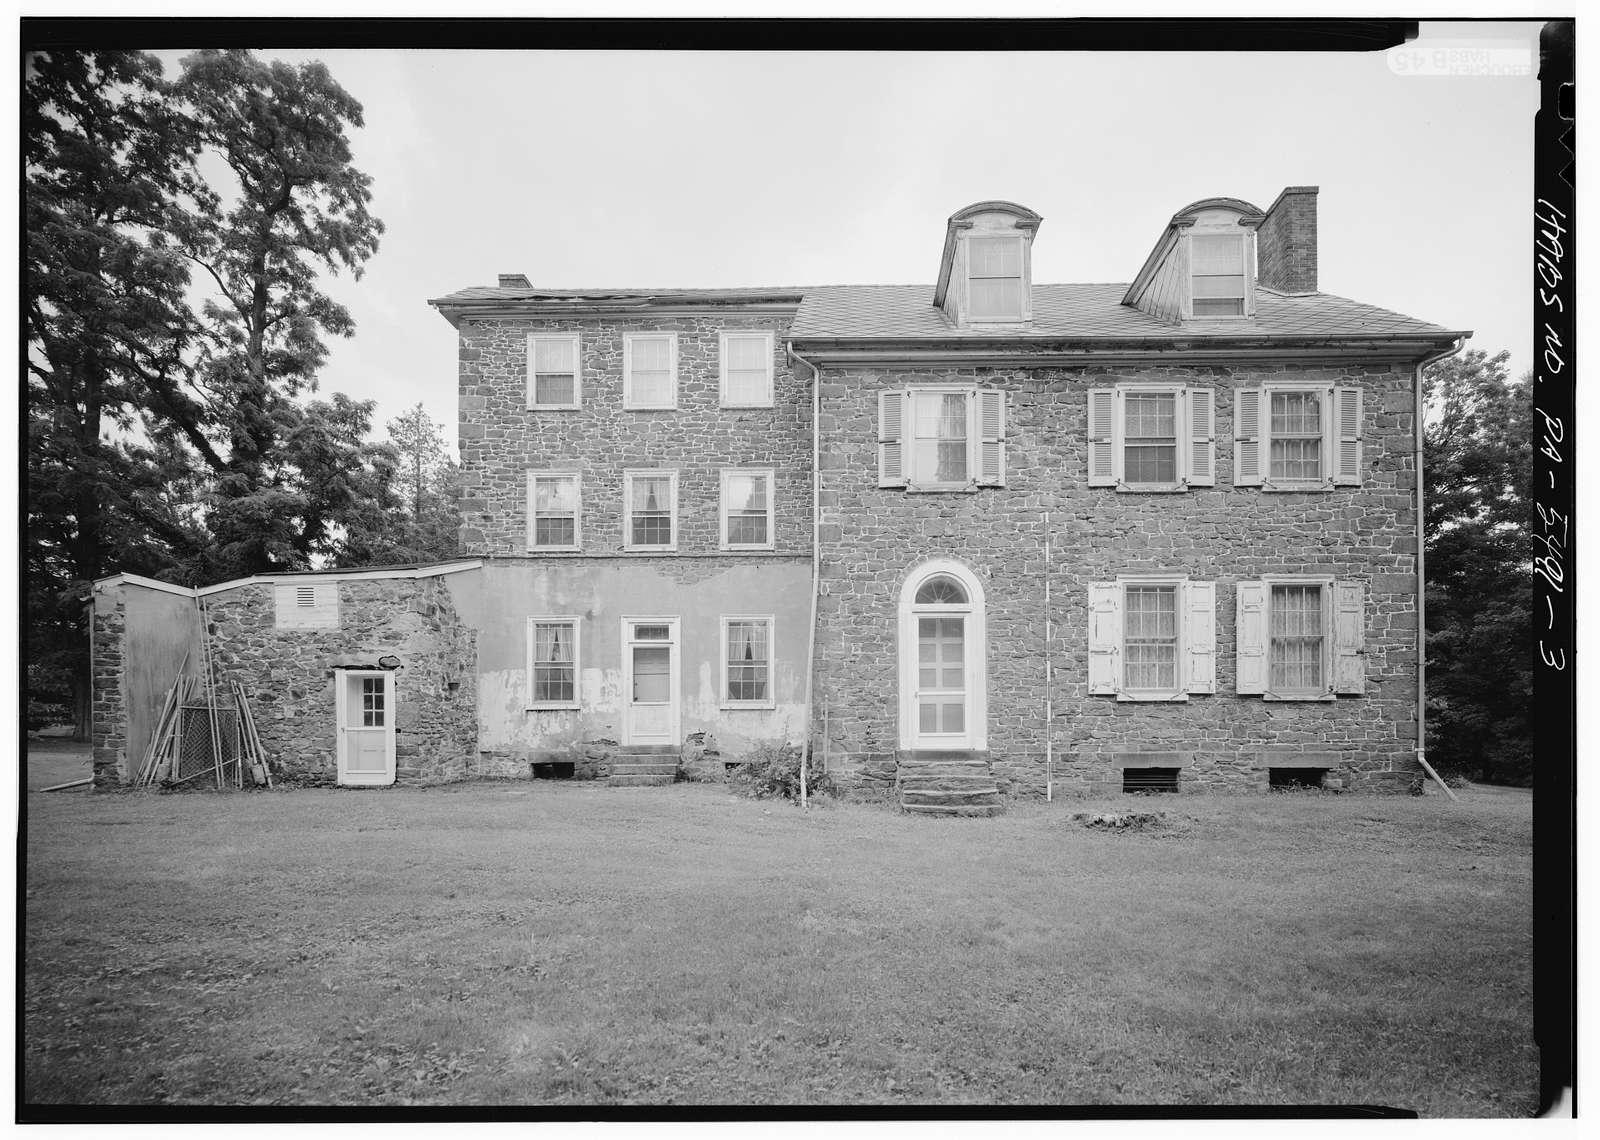 Naylor House, Swift & Silver Lake Roads (Middletown Township), Langhorne, Bucks County, PA